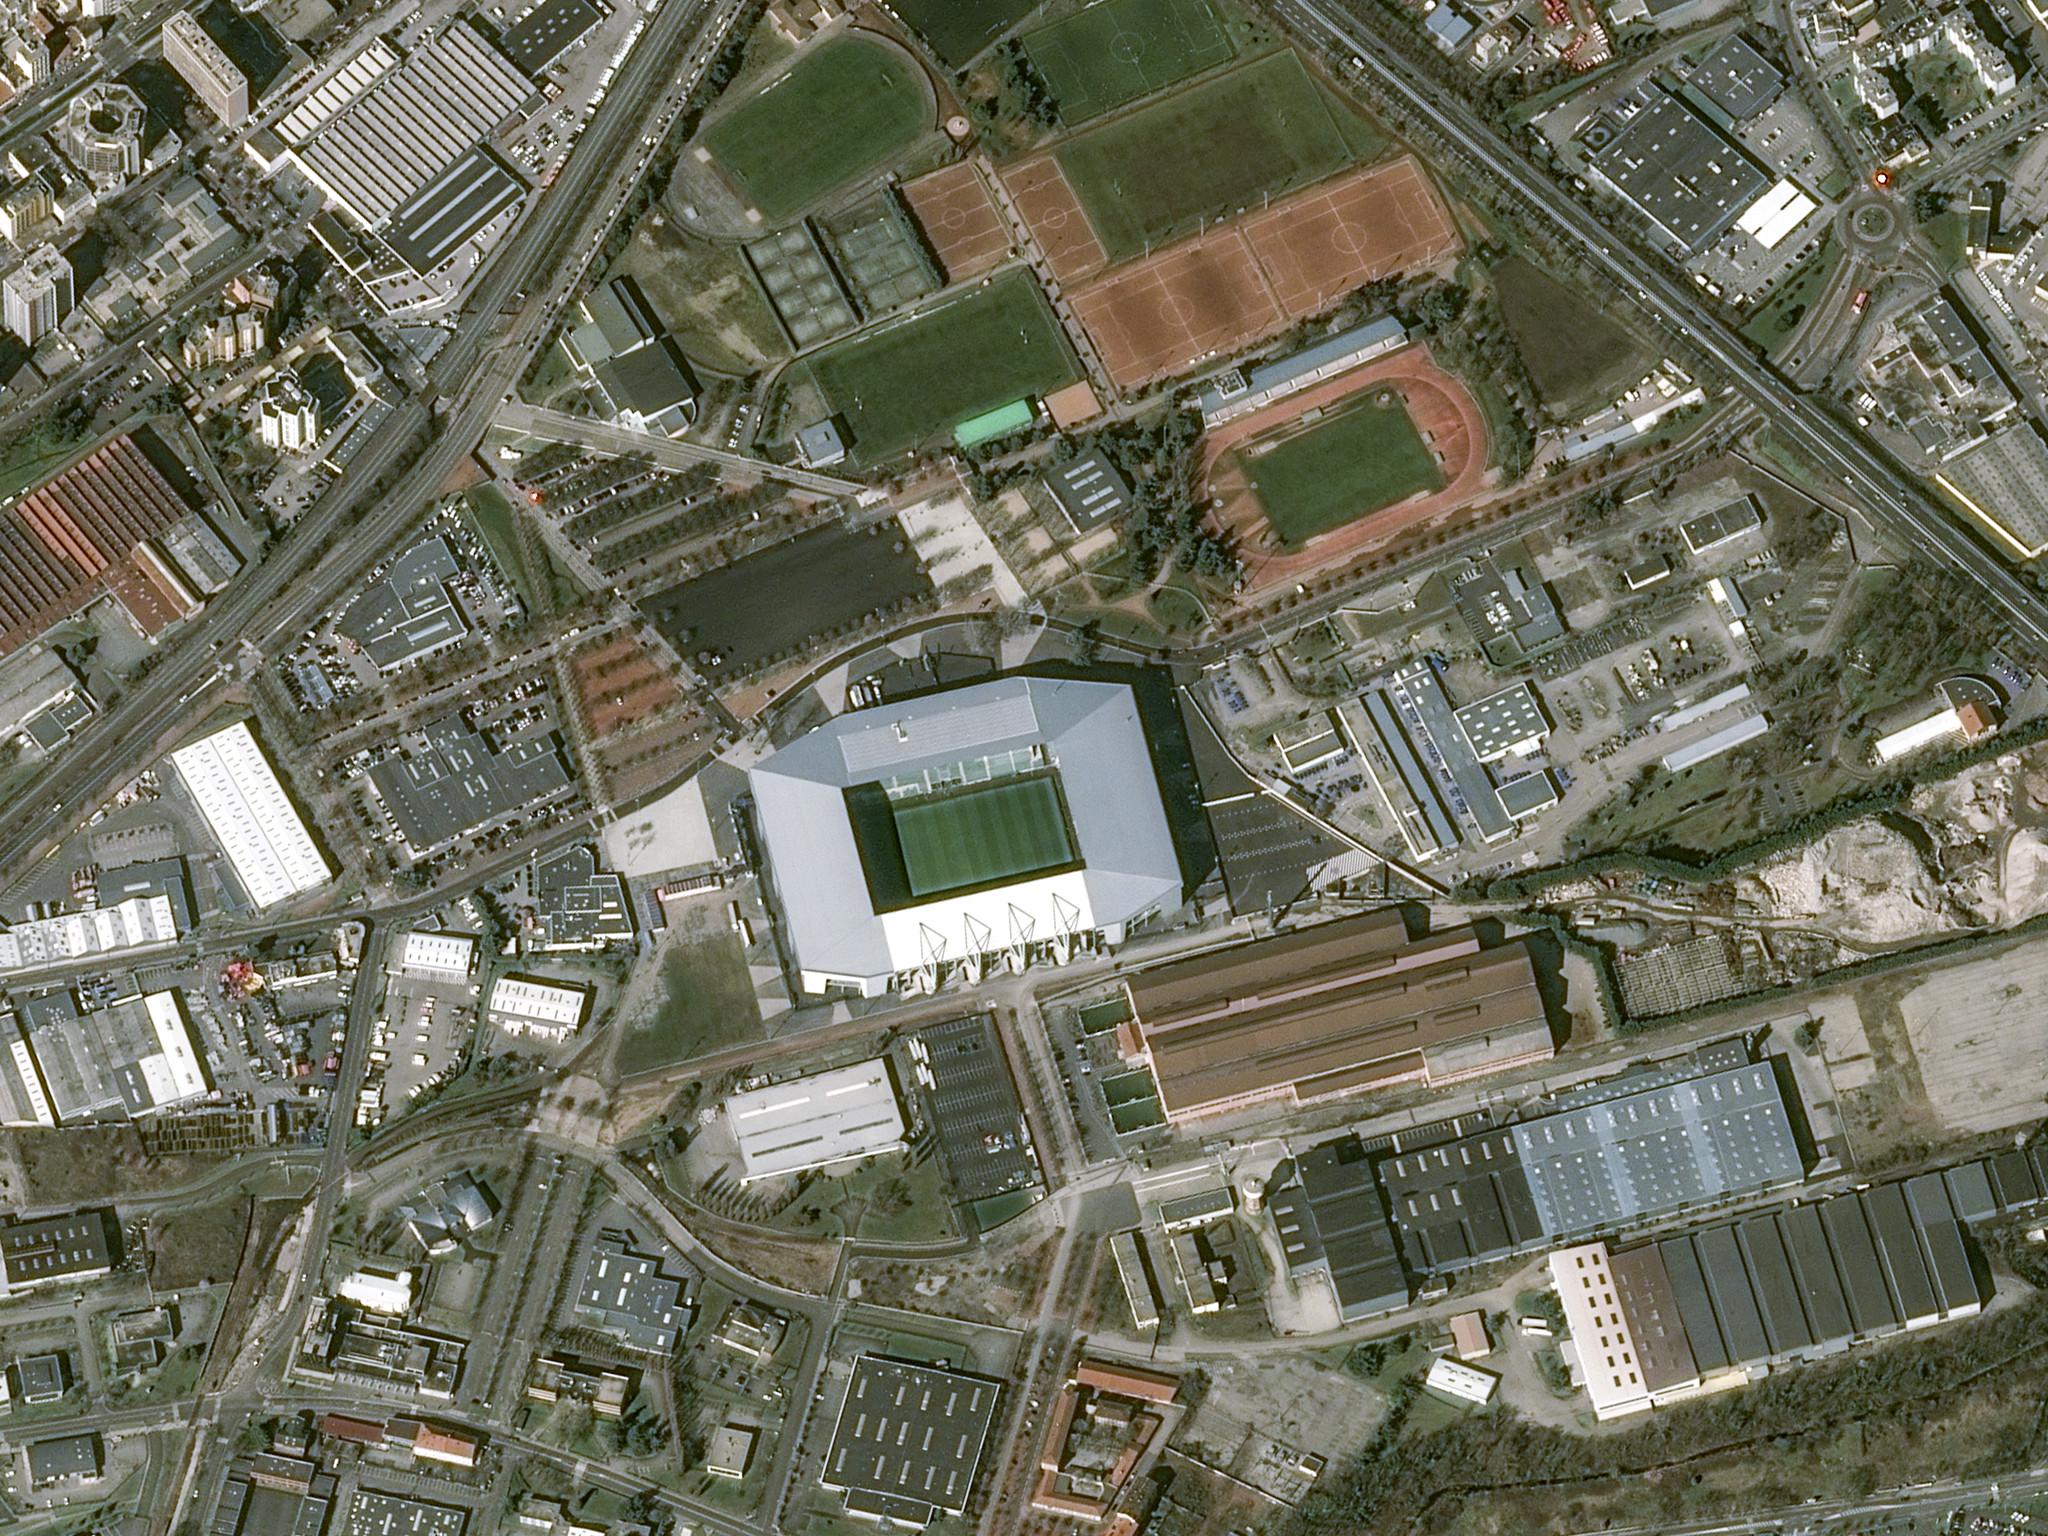 is_euro2016_stade_stetienne_pleiades_20160319.jpg